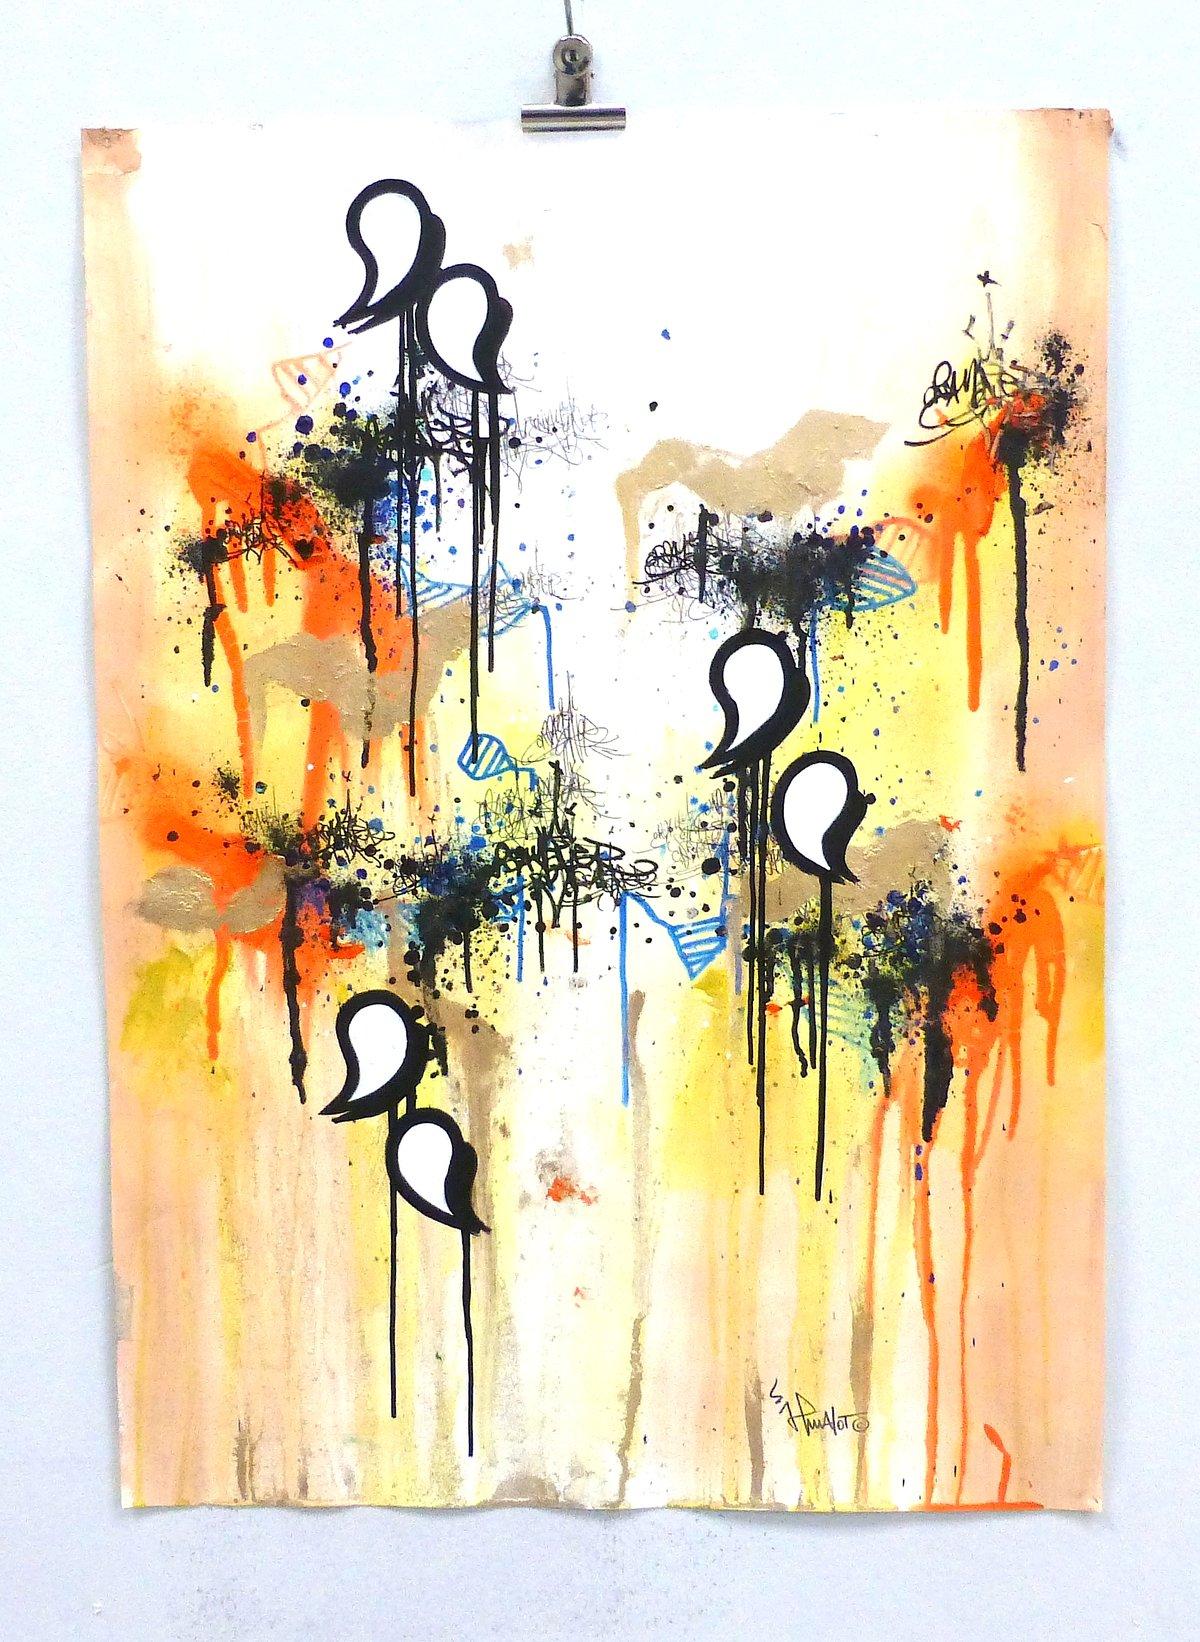 Image of JP MALOT 'Tags and abstract 2021'